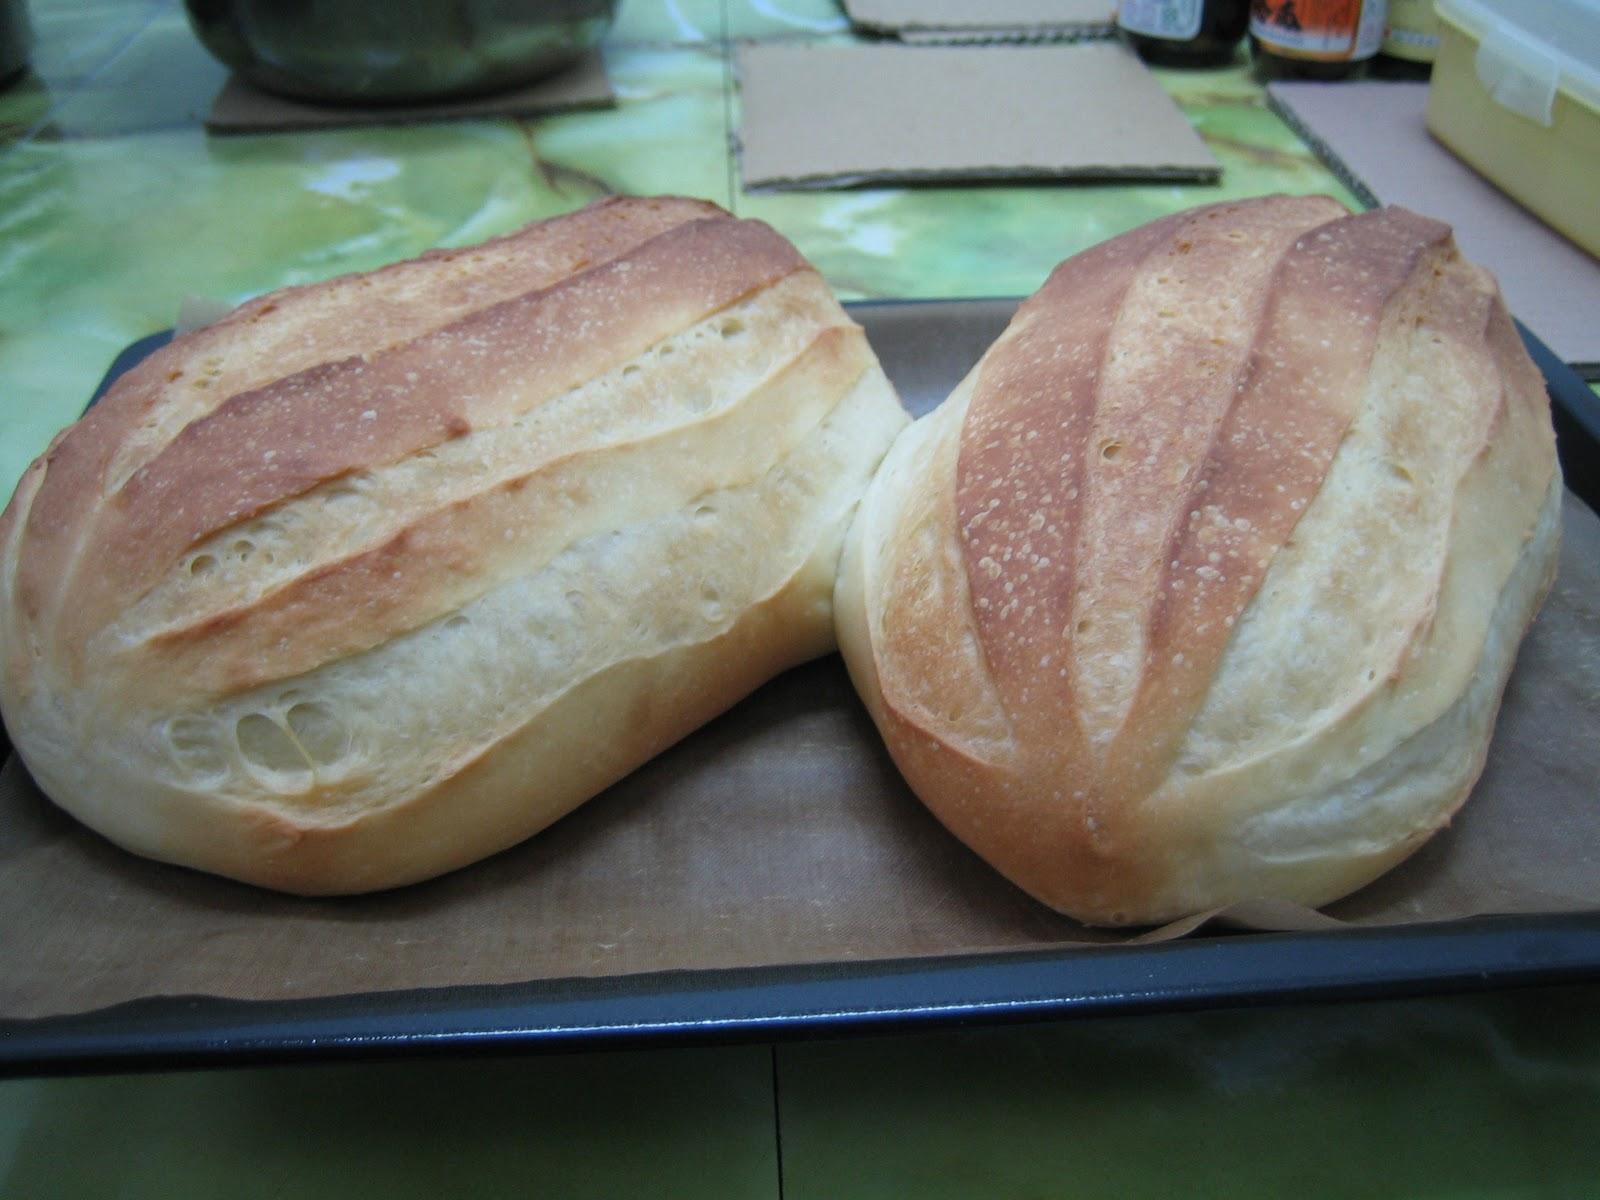 Emma's magic kitchen: 牛奶哈斯麵包(摺疊法.免甩打)